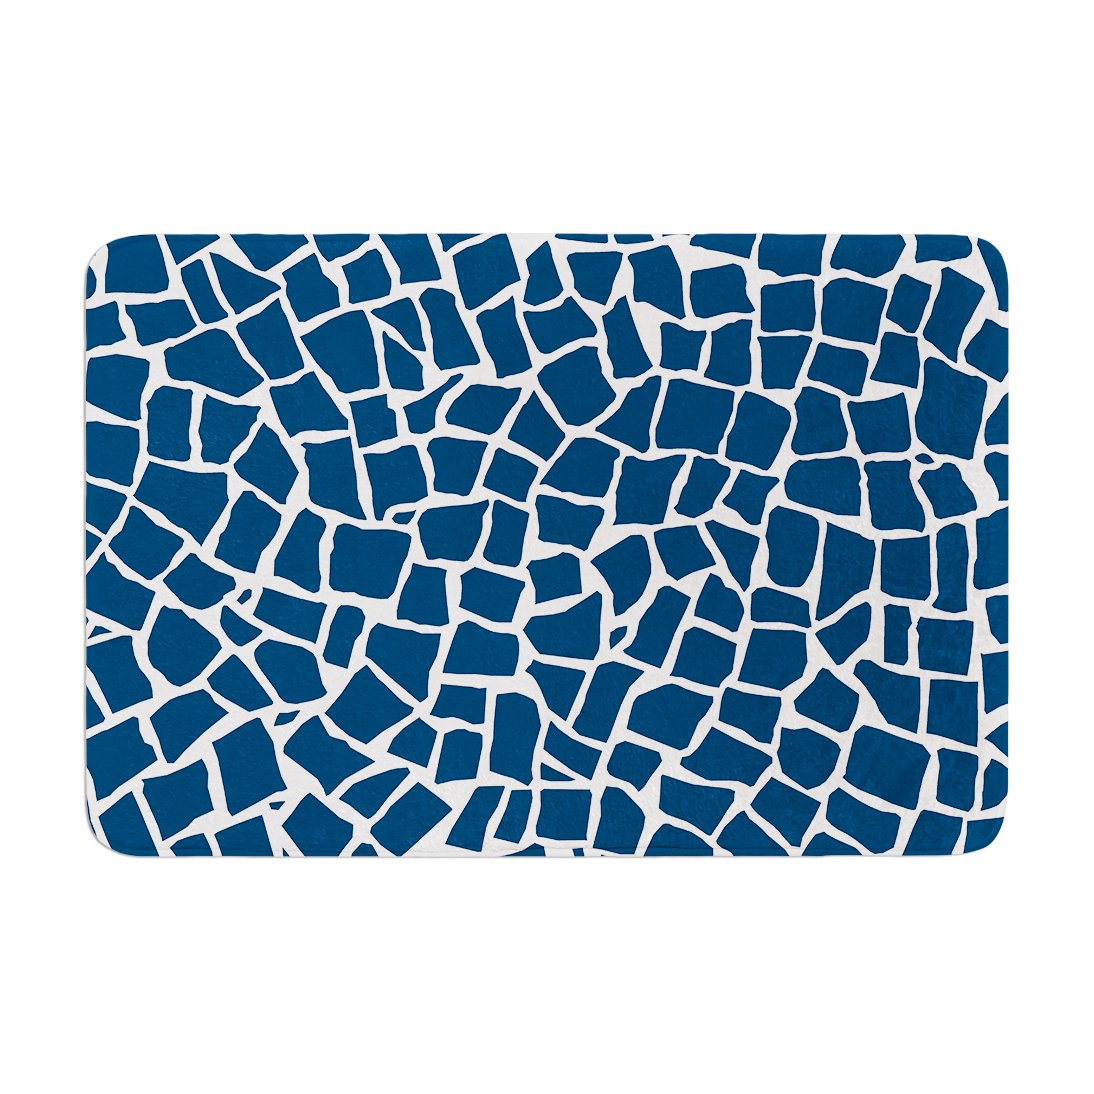 Kess InHouse Project M British Mosaic Navy Memory Foam Bath Mat 17 by 24